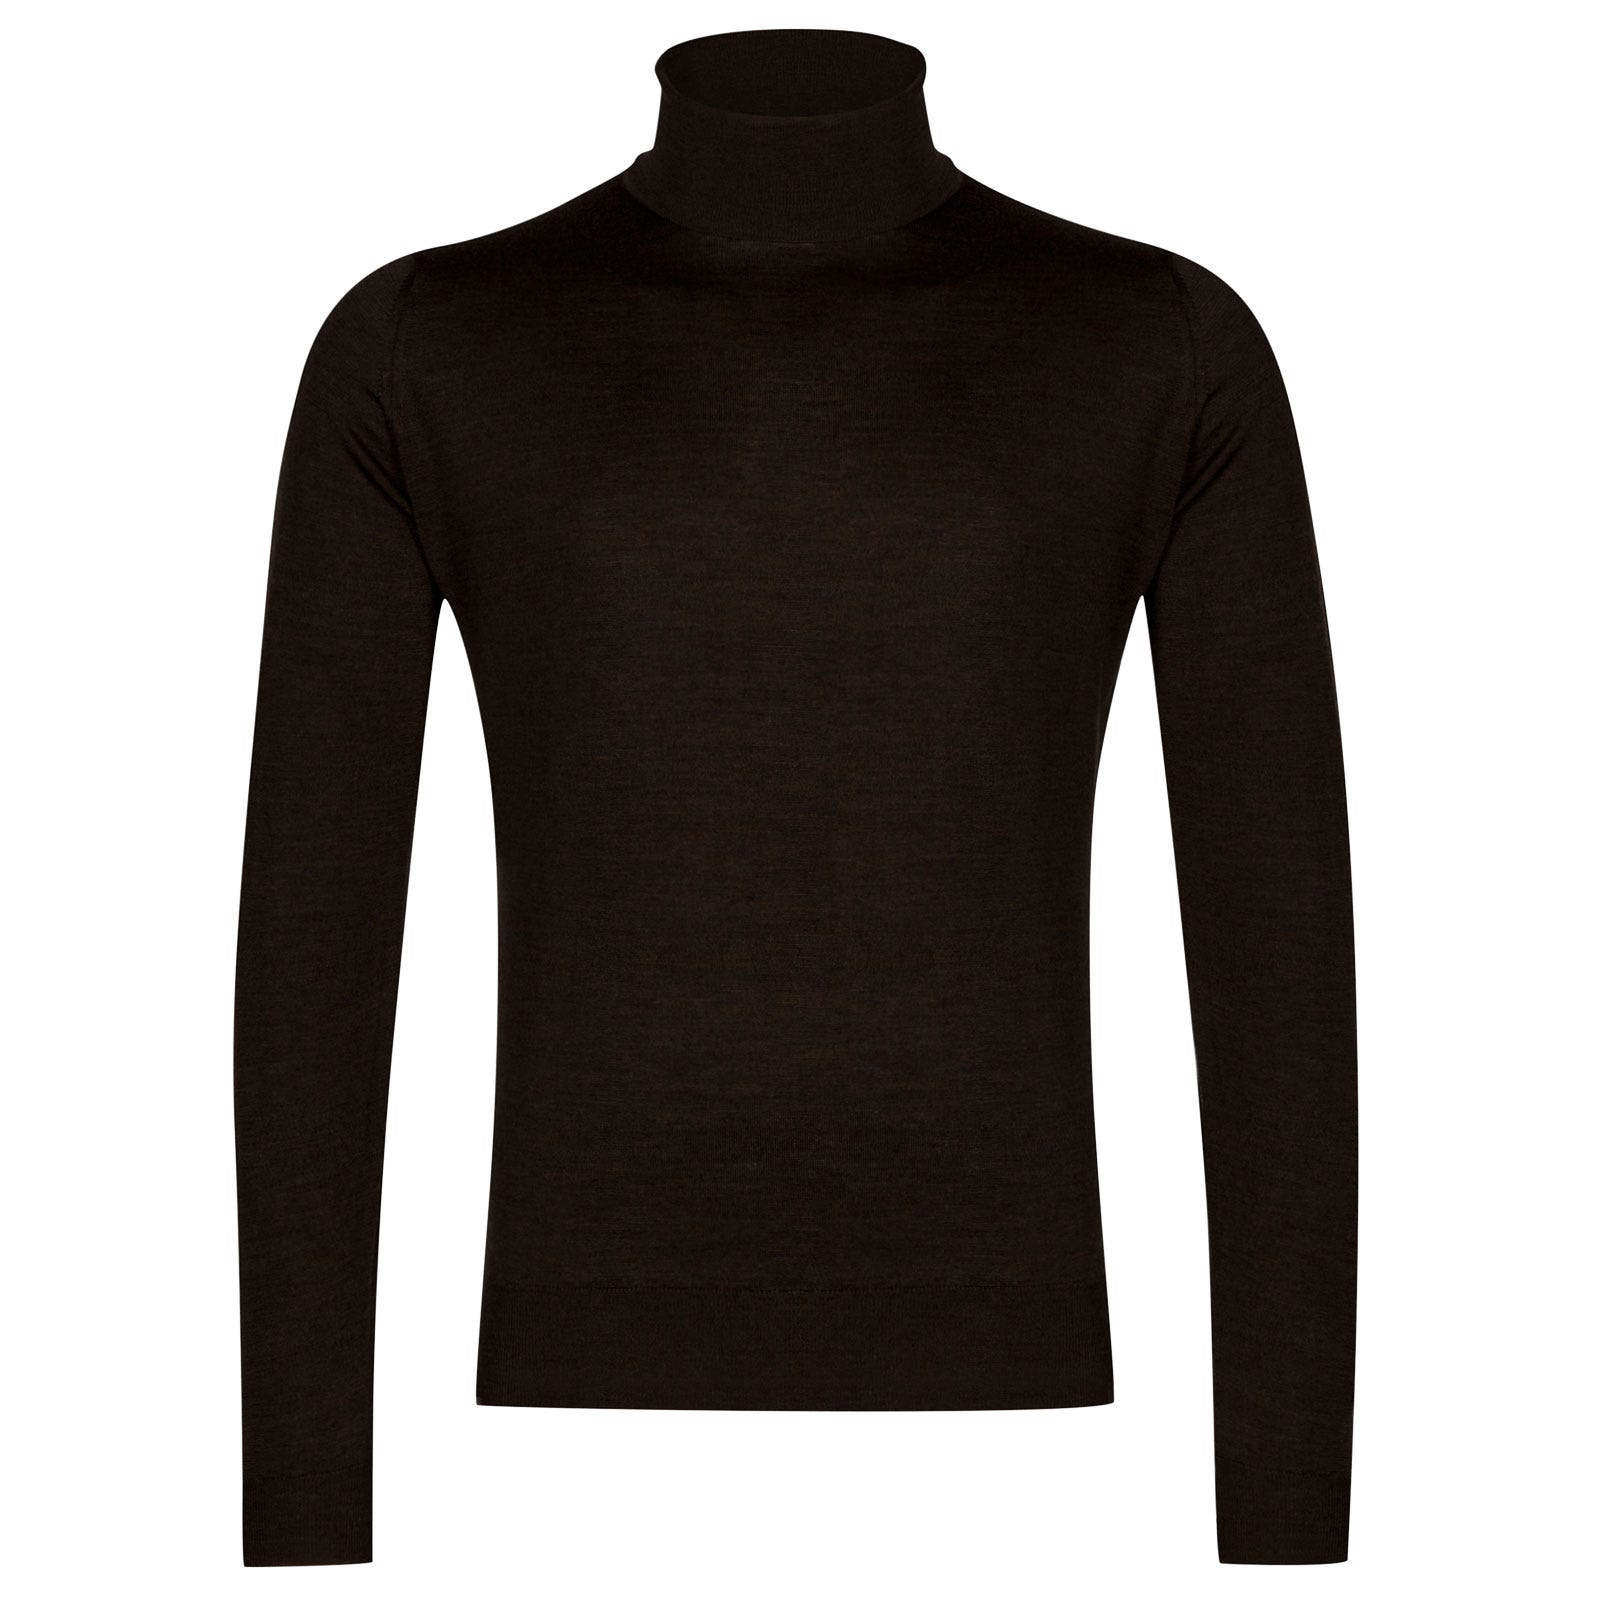 John Smedley cherwell Merino Wool Pullover in Chestnut-XXL